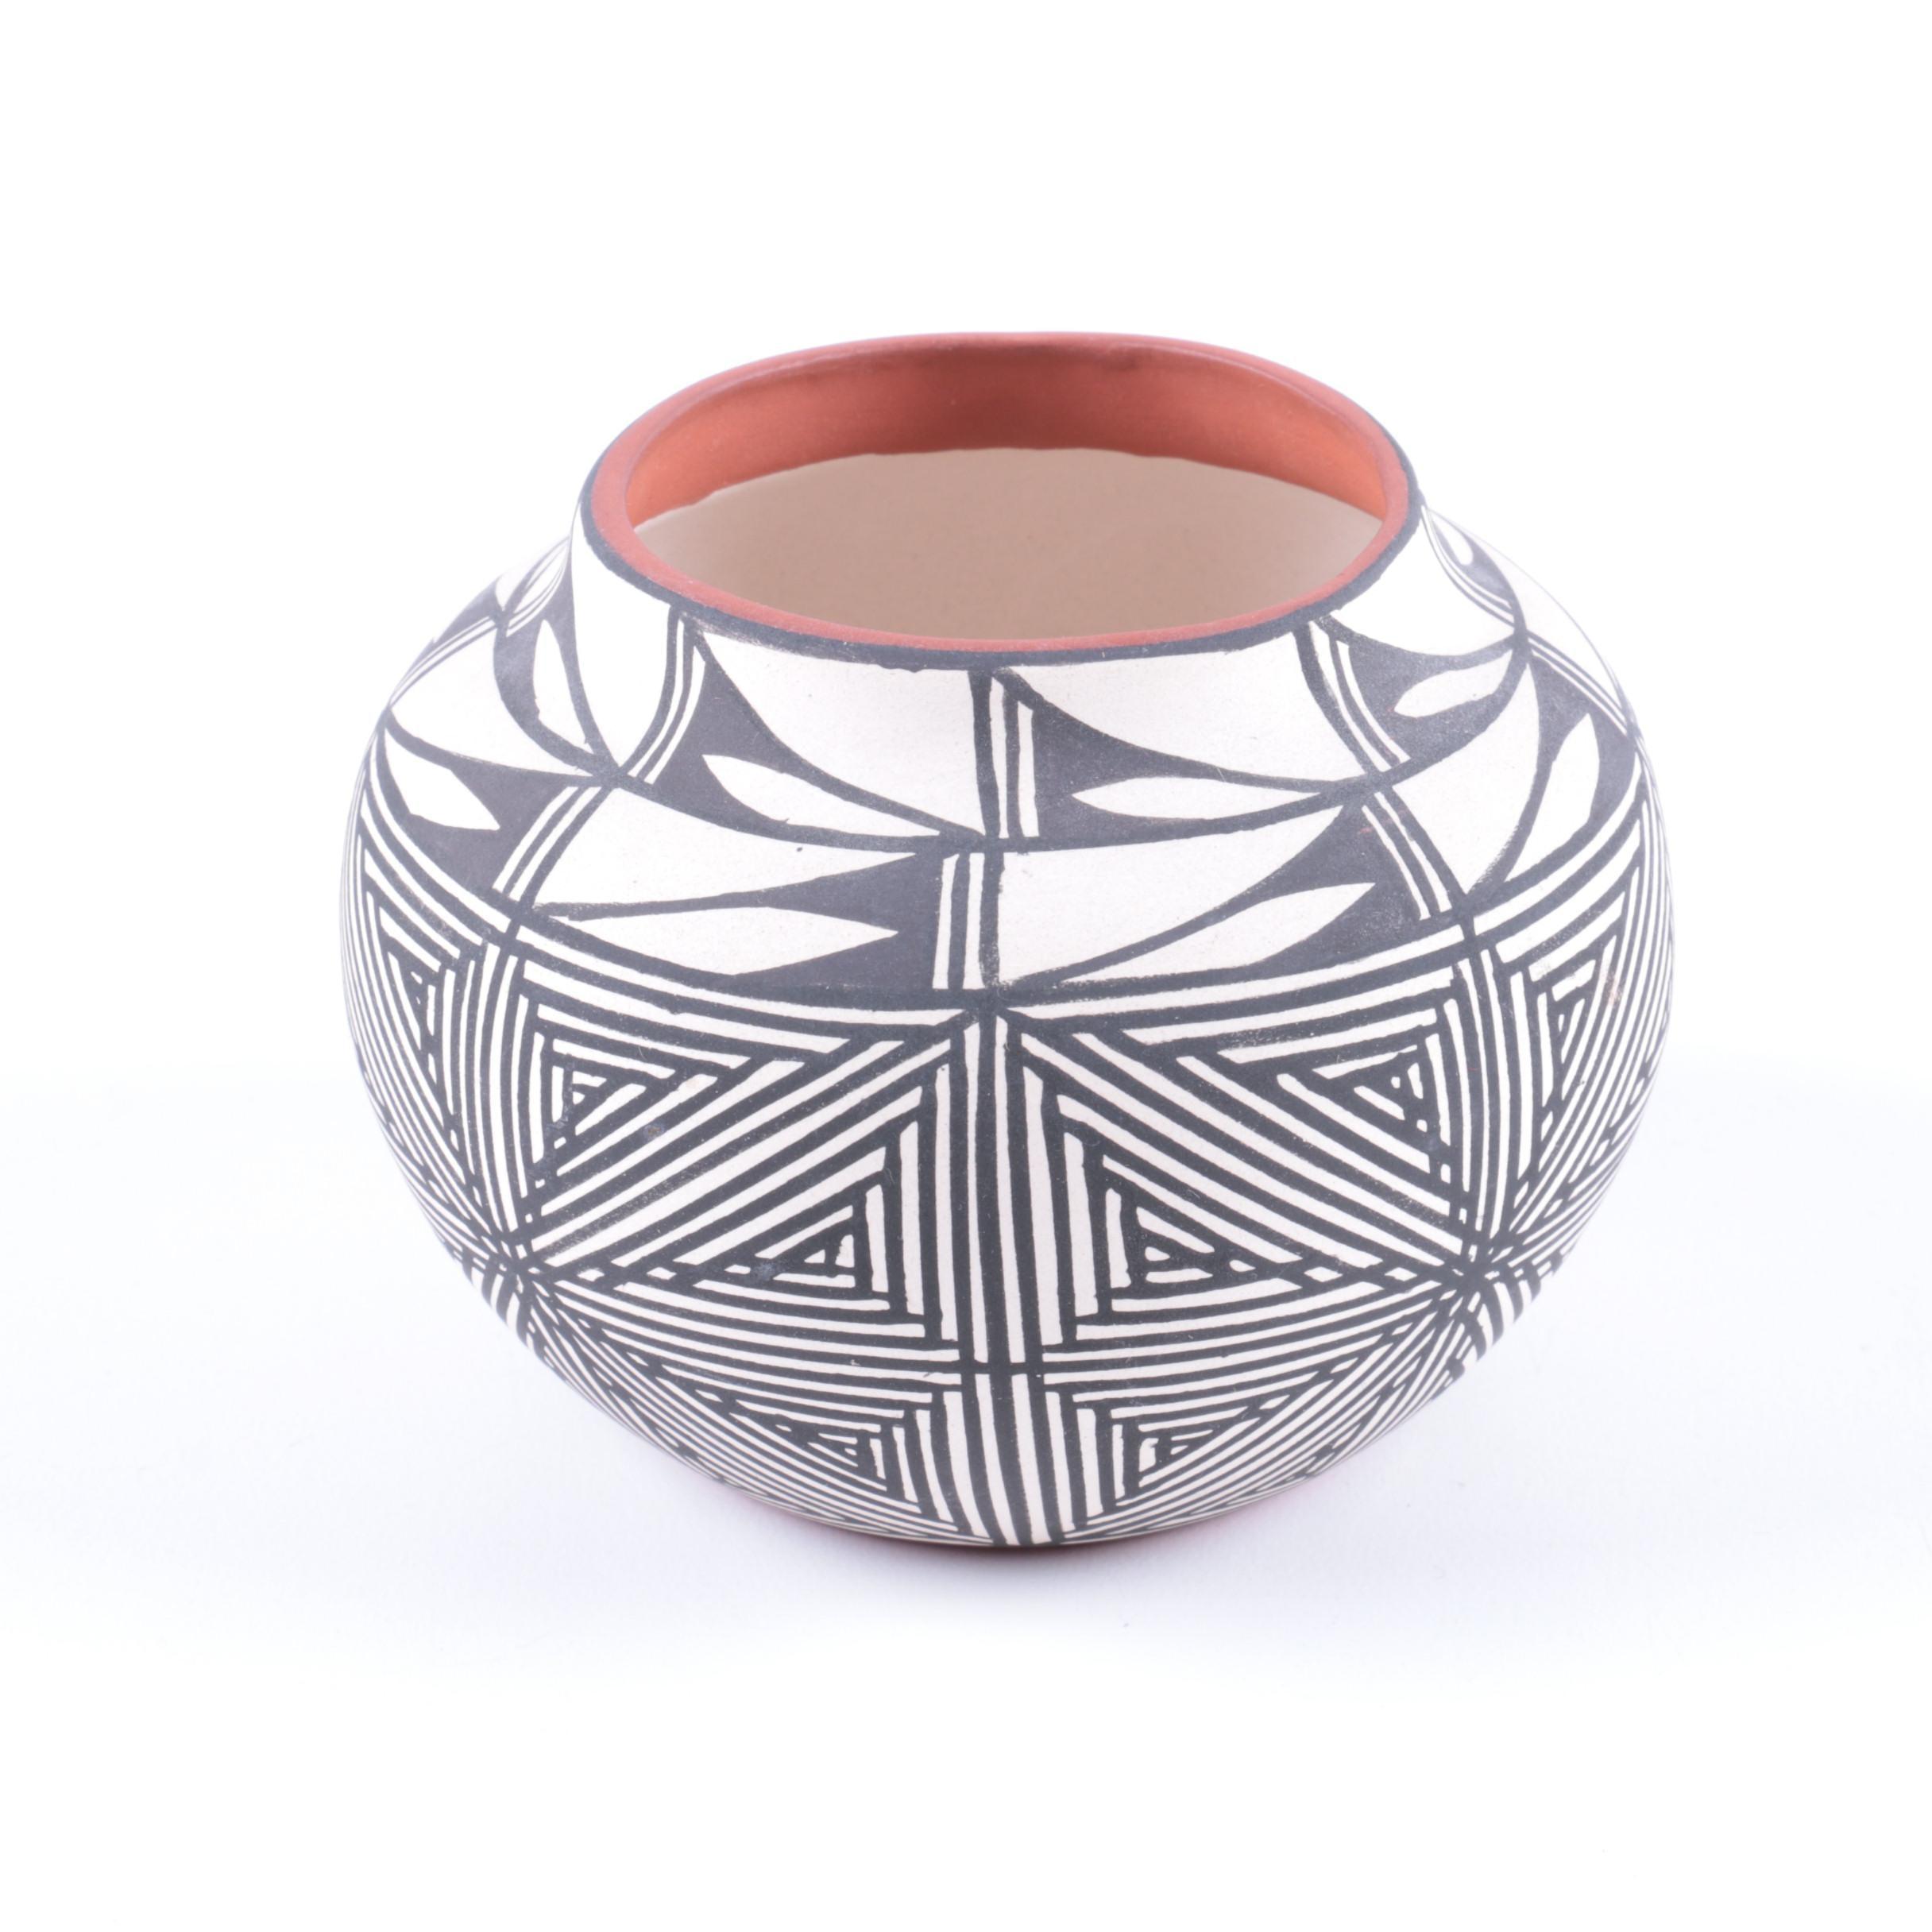 Emmalito Chino Native American Black and White Bowl